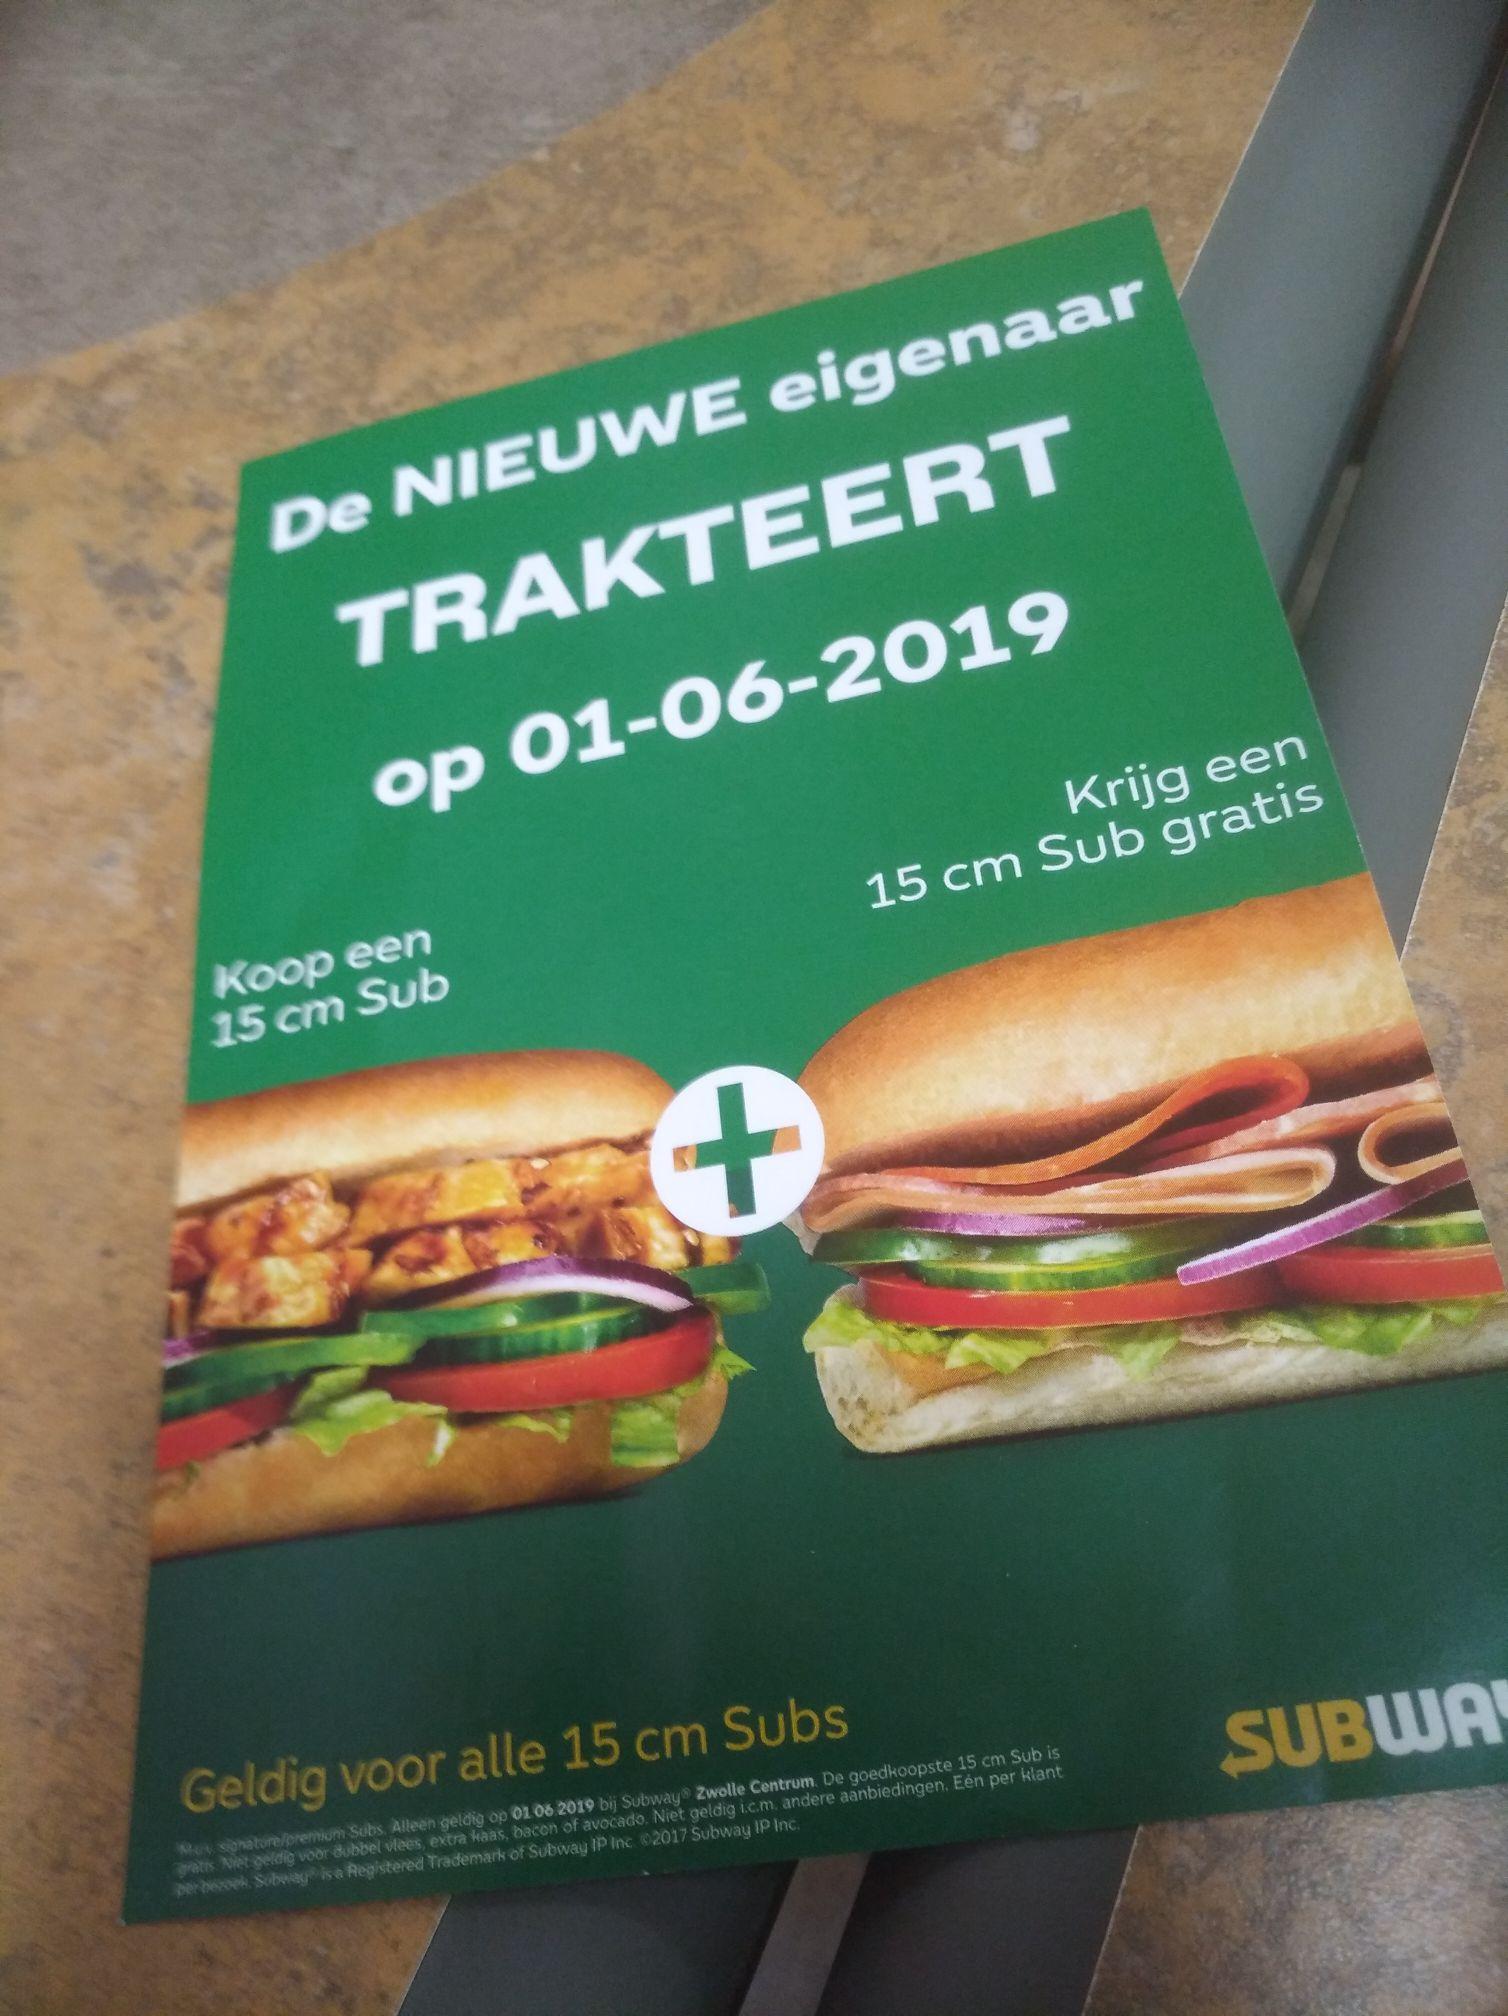 Subway Zwolle centrum subs 1+1 op 1 juni